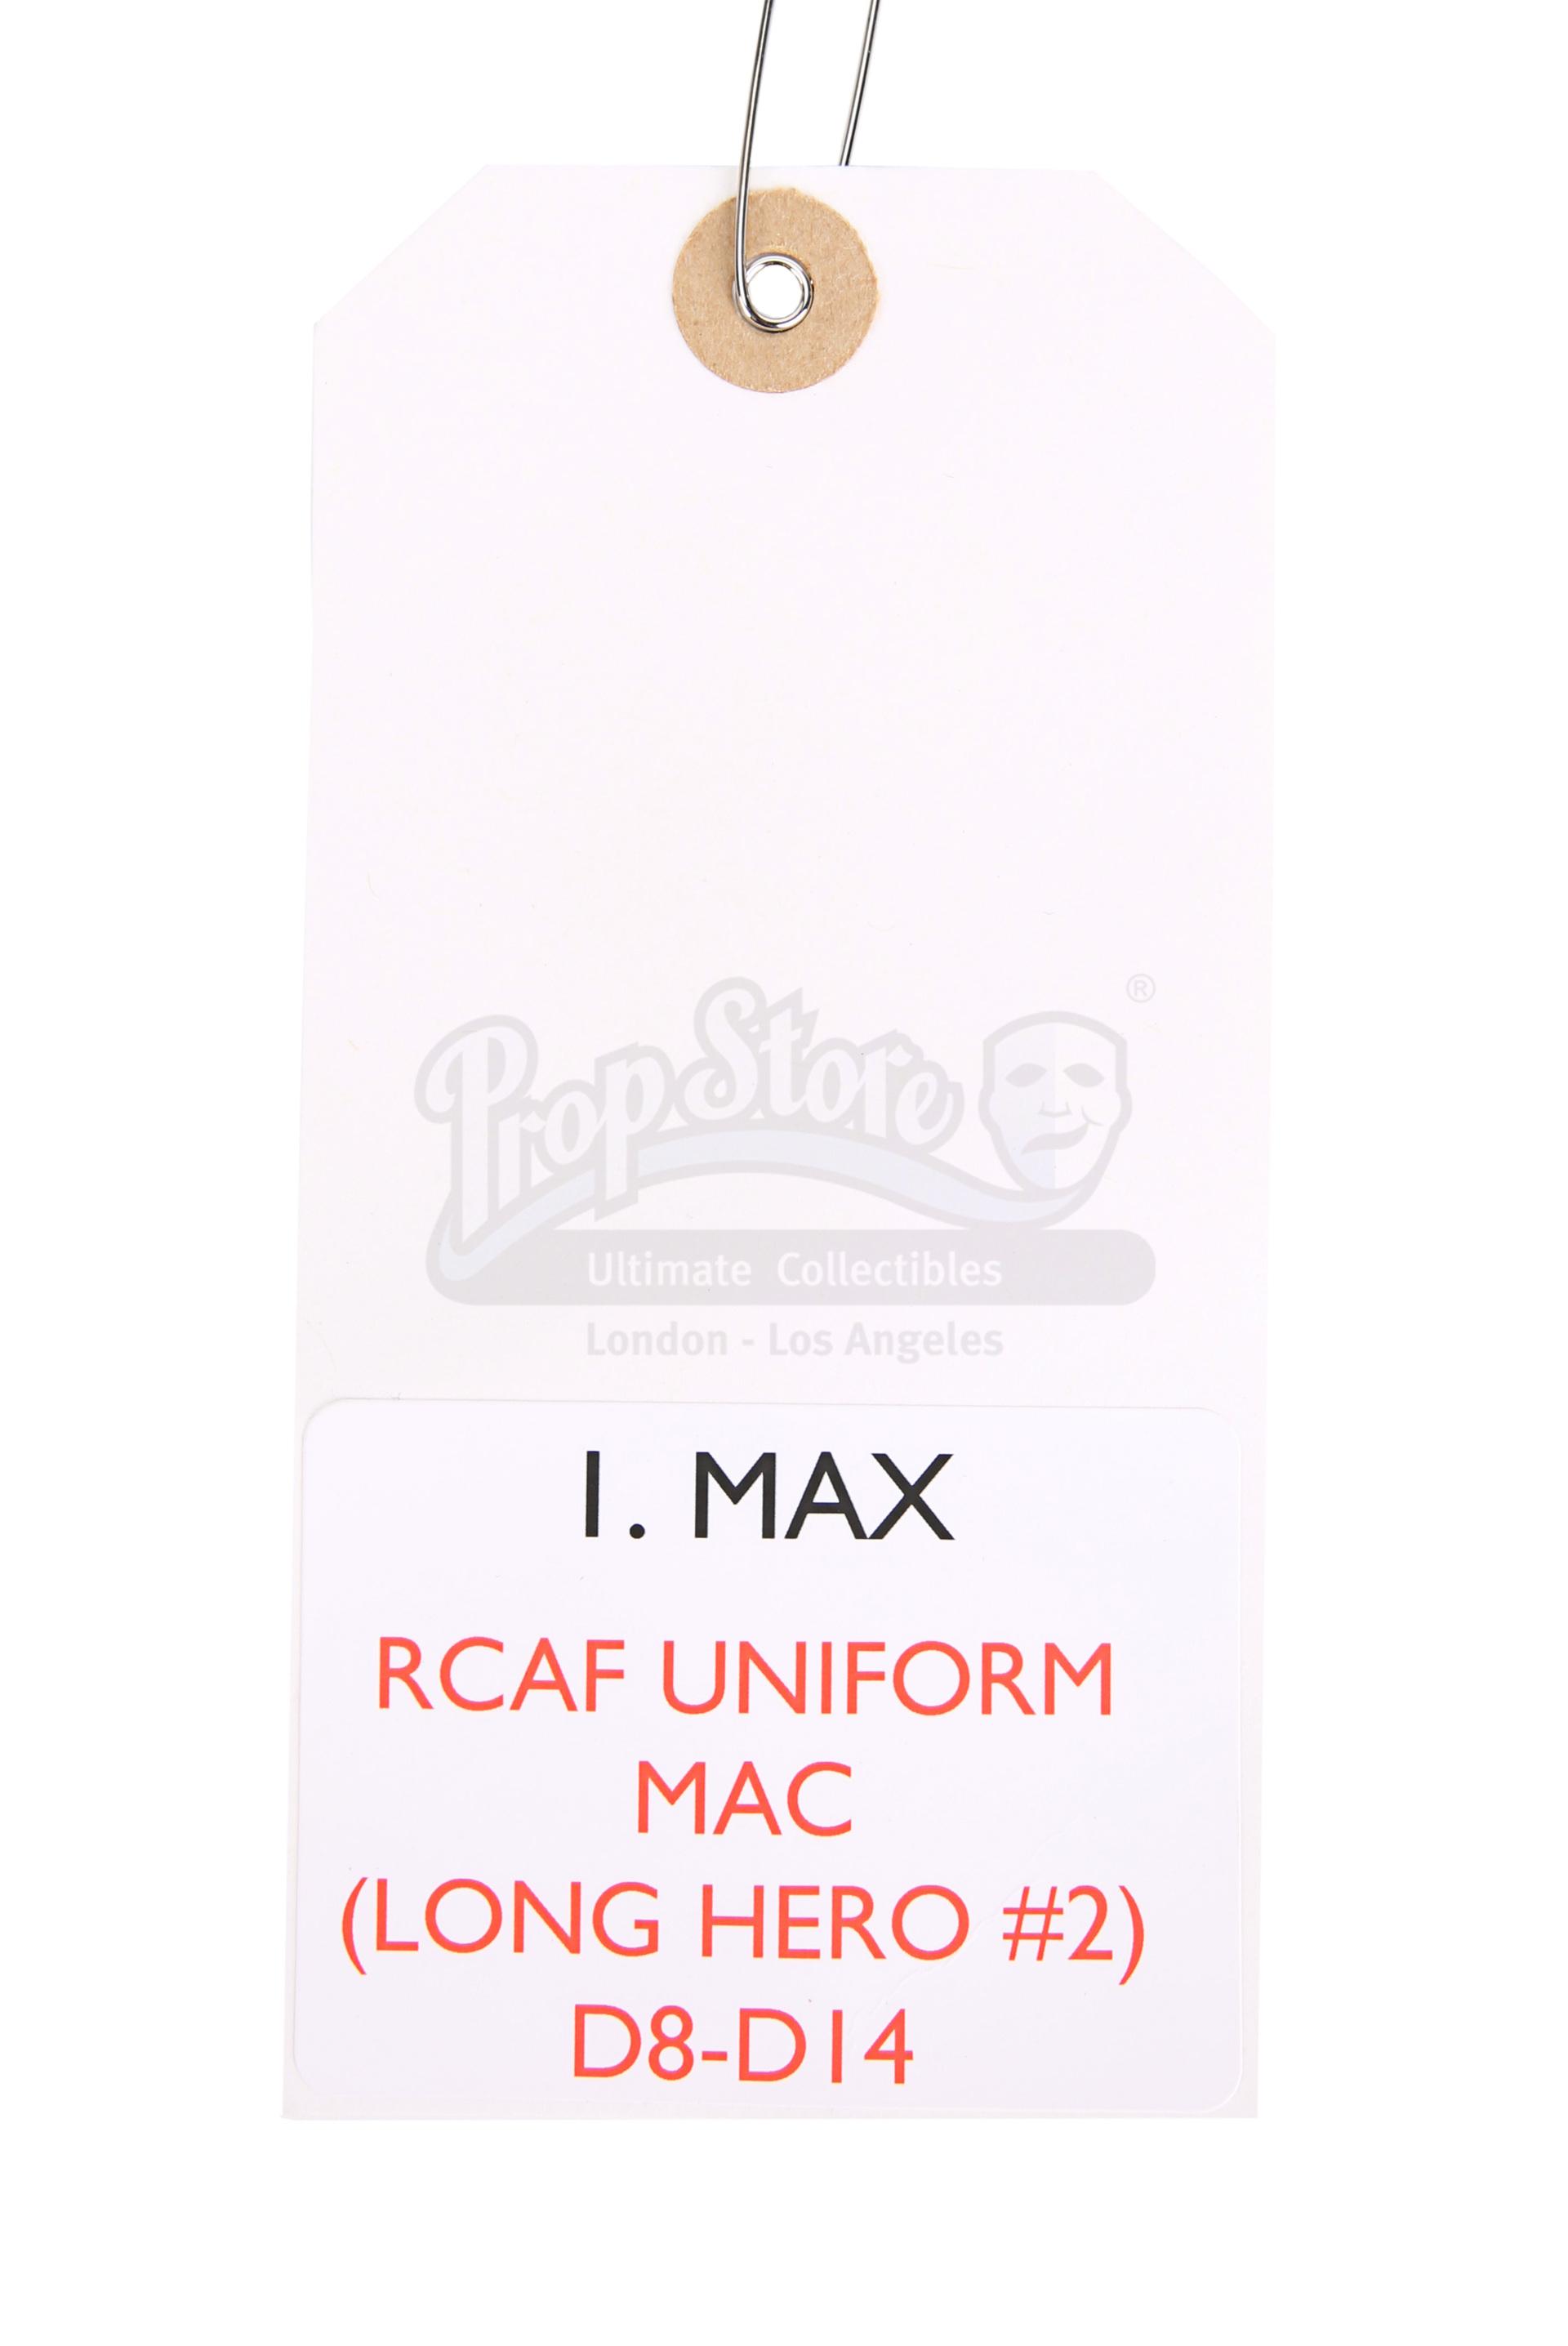 ALLIED (2016) - Max's (Brad Pitt) Military Overcoat - Image 8 of 17